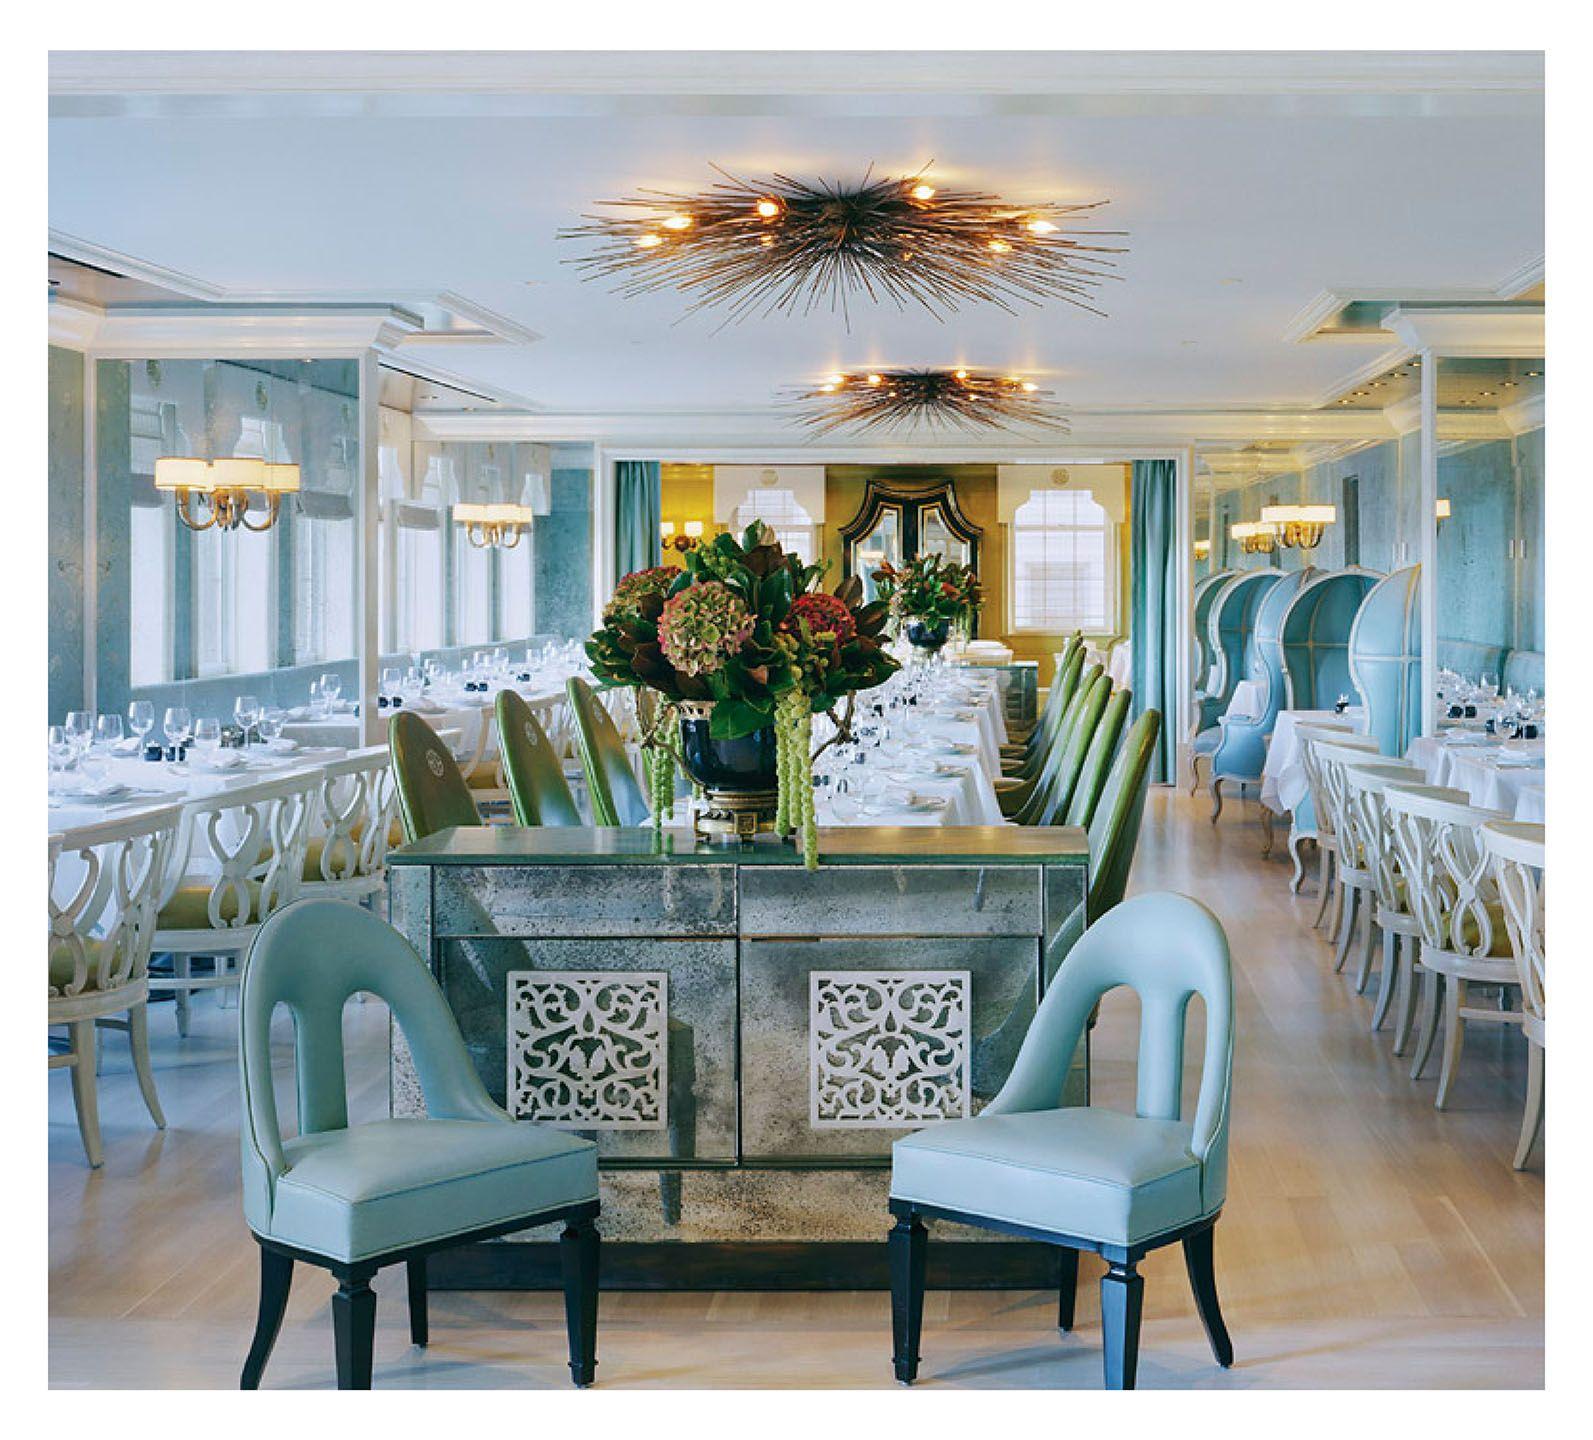 bergdorf goodman restaurant interior design by kelly wearstler